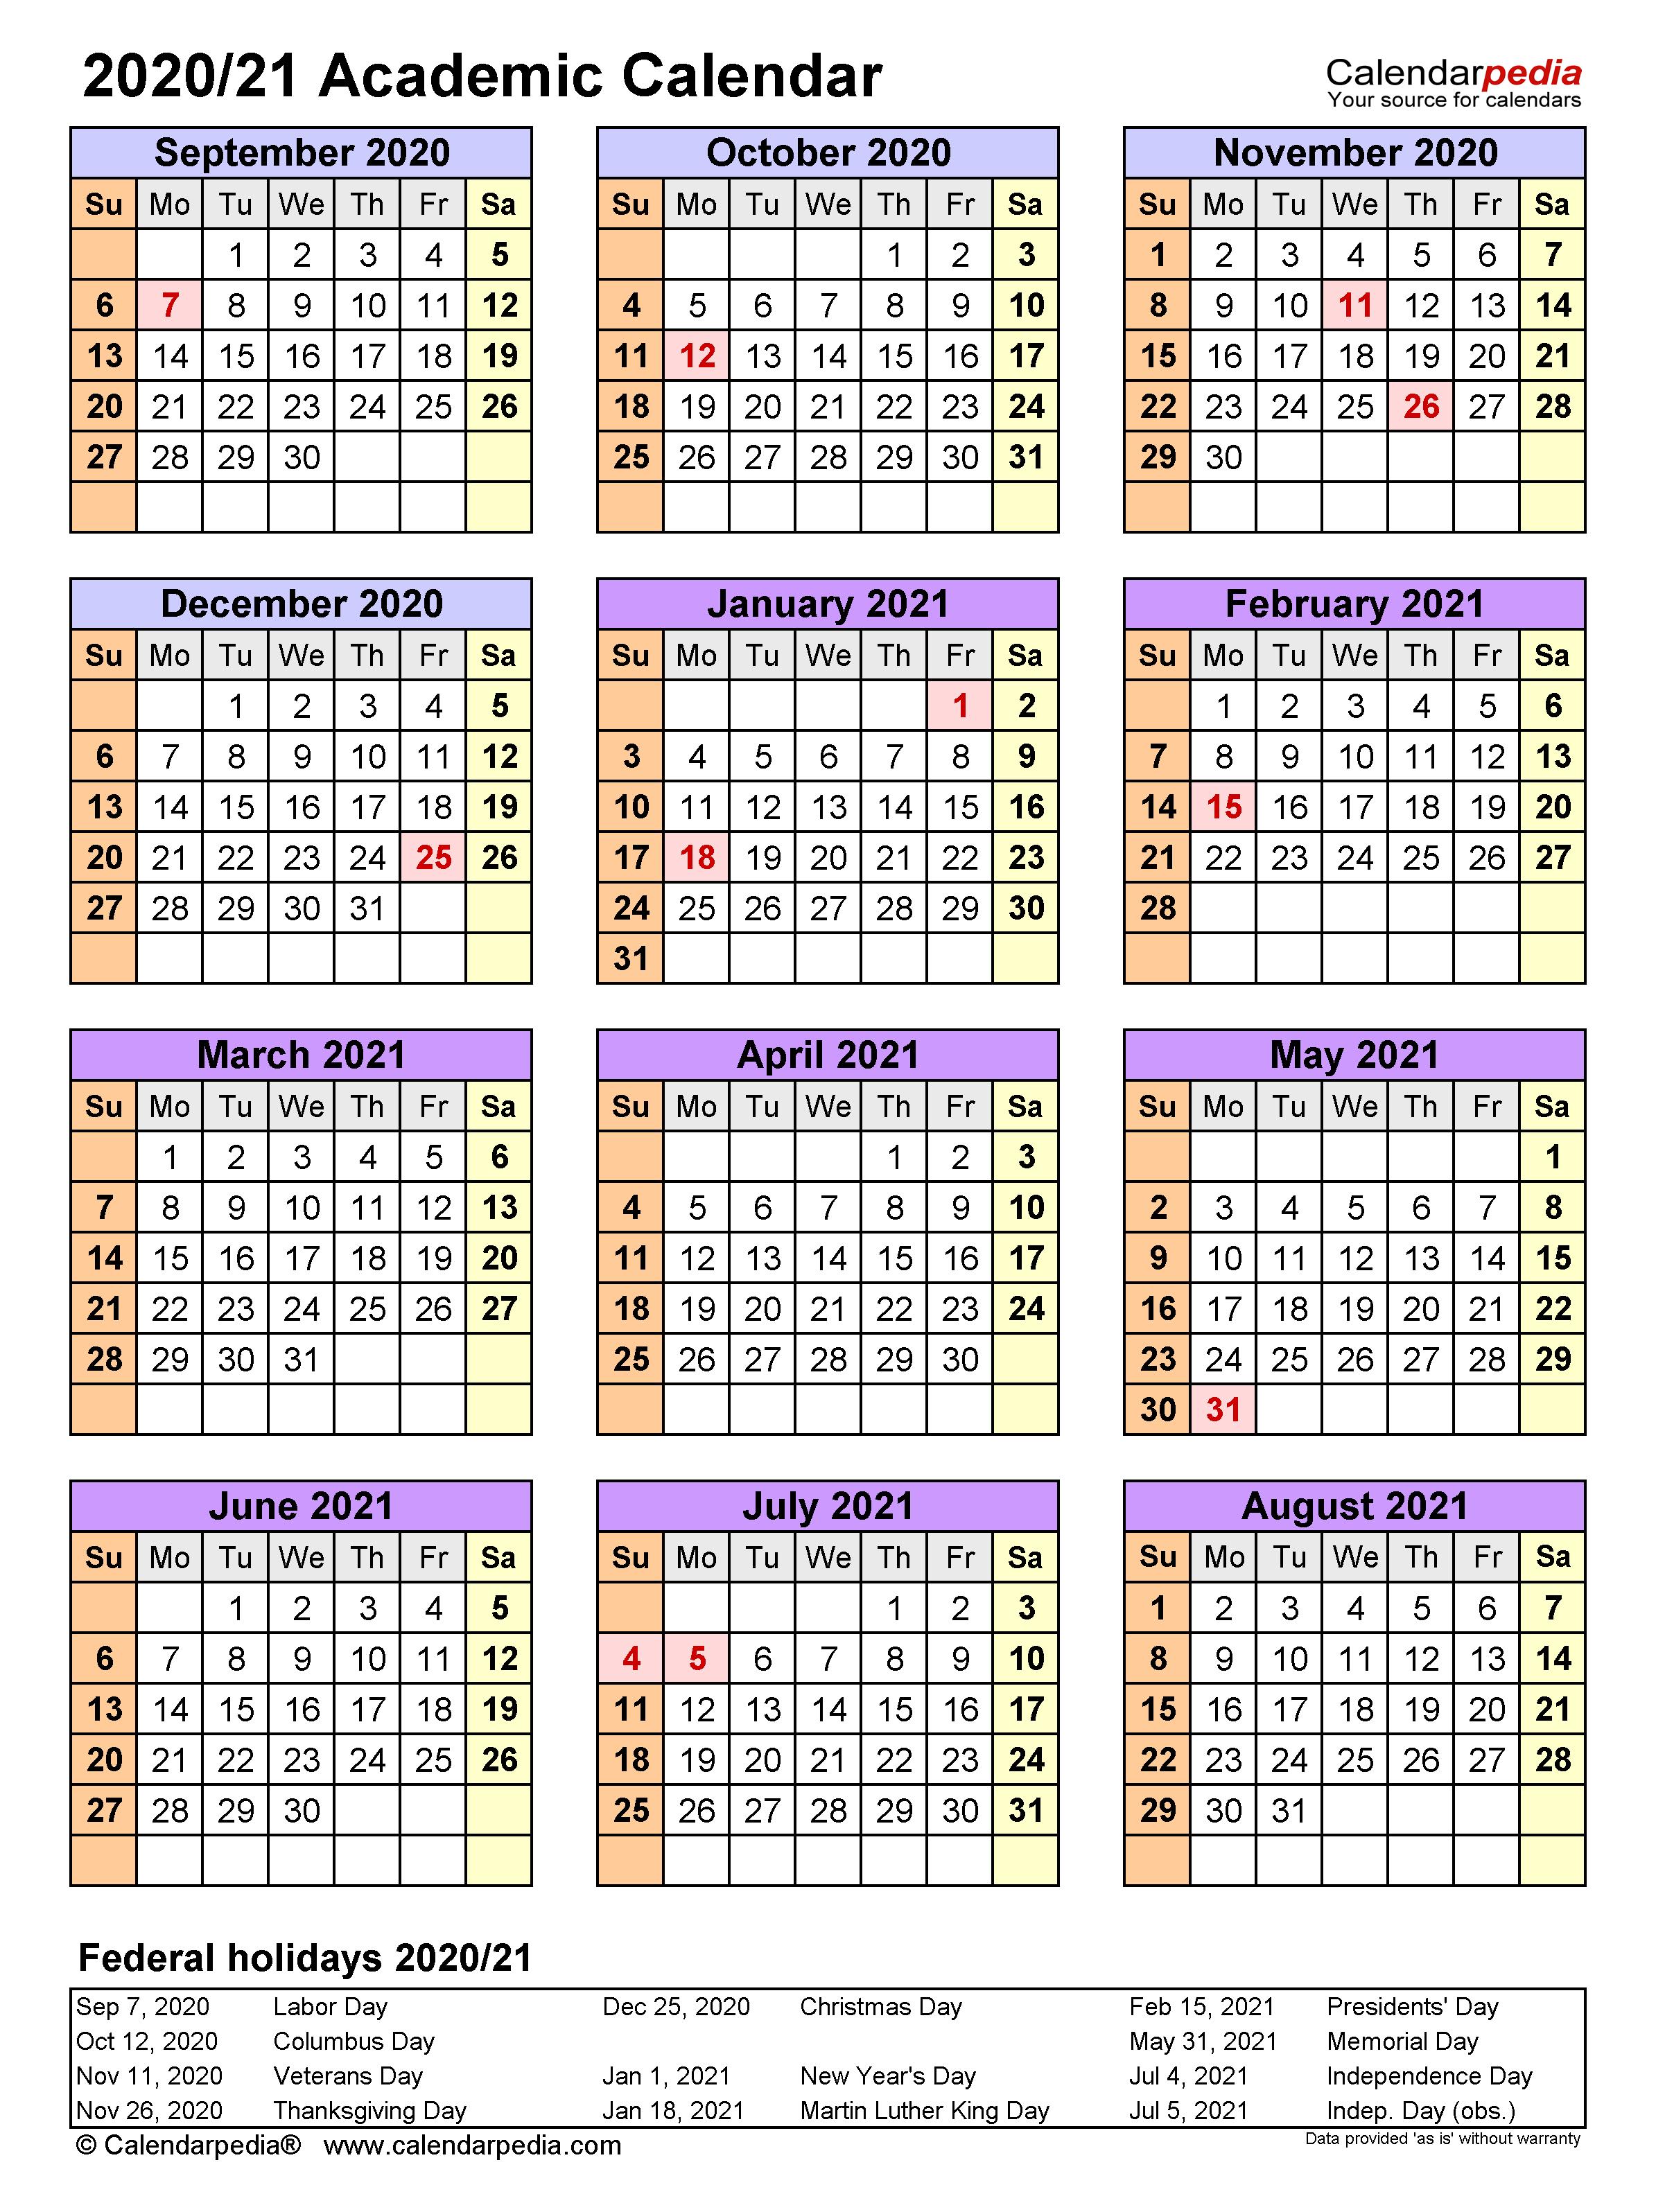 Academic Calendars 2020/2021 – Free Printable Word Templates Inside Printable 2020 2021 School Calendar